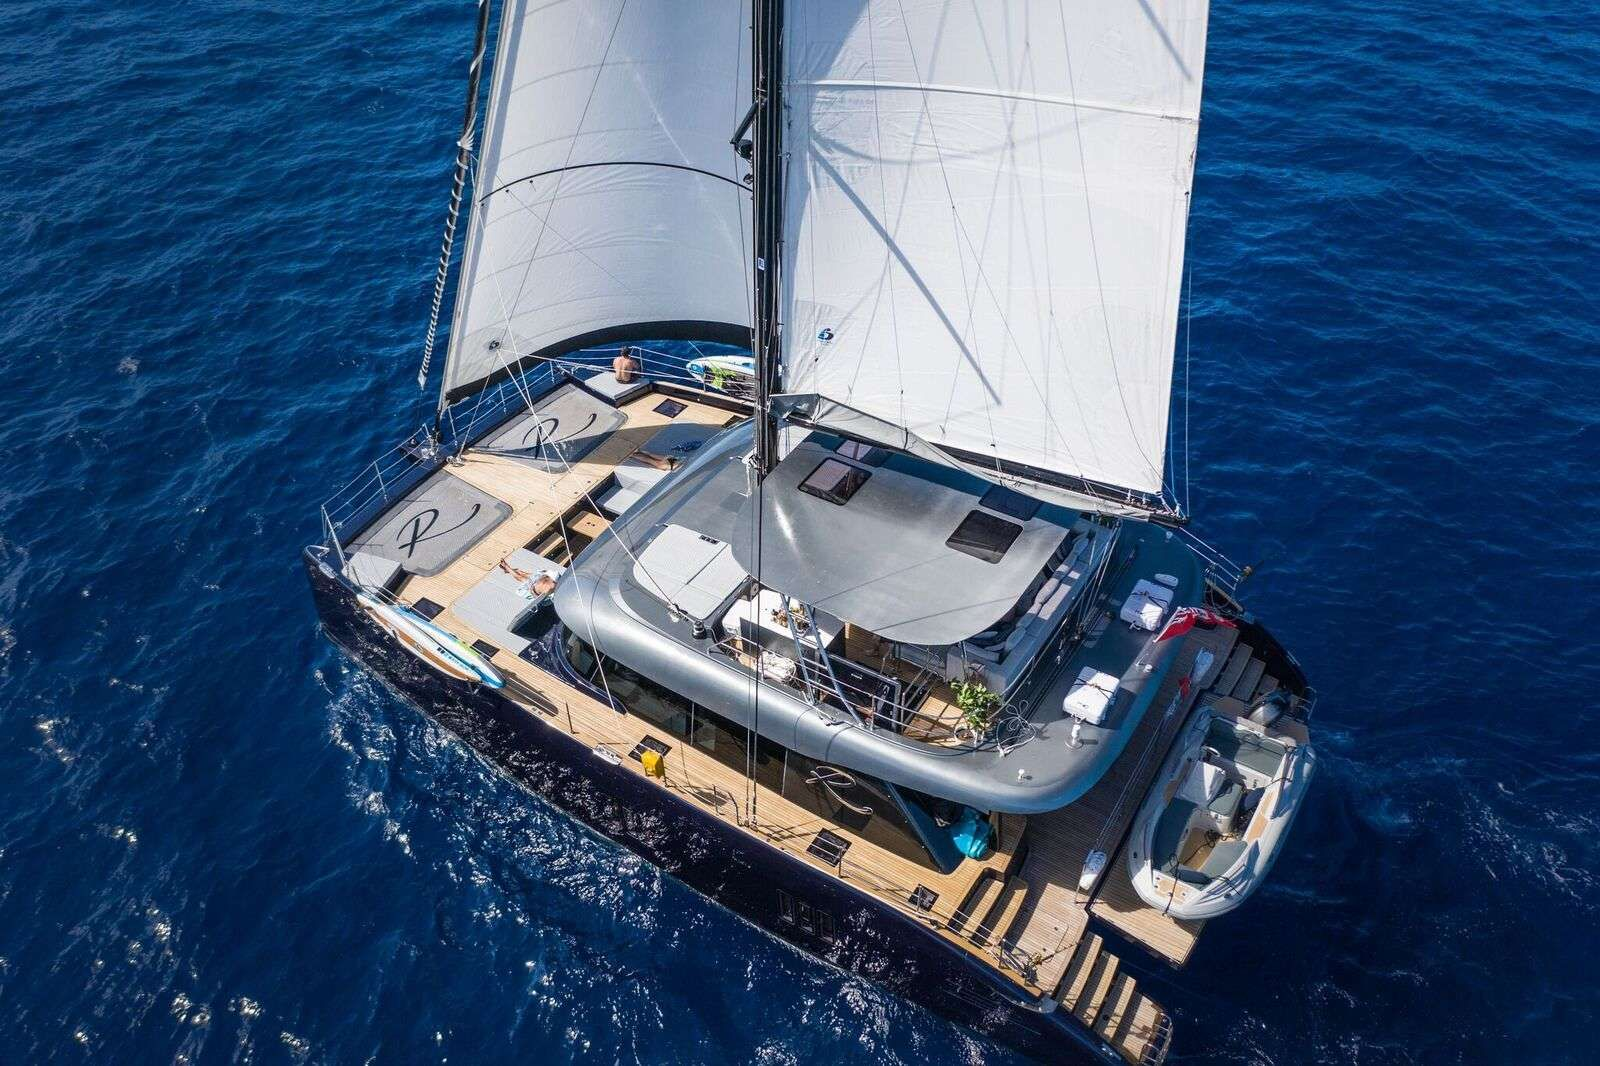 RELENTLESS - Sunreef 60 - 4 Cabins - Virgin Islands - St Thomas - Tortola - Virgin Gorda - St John